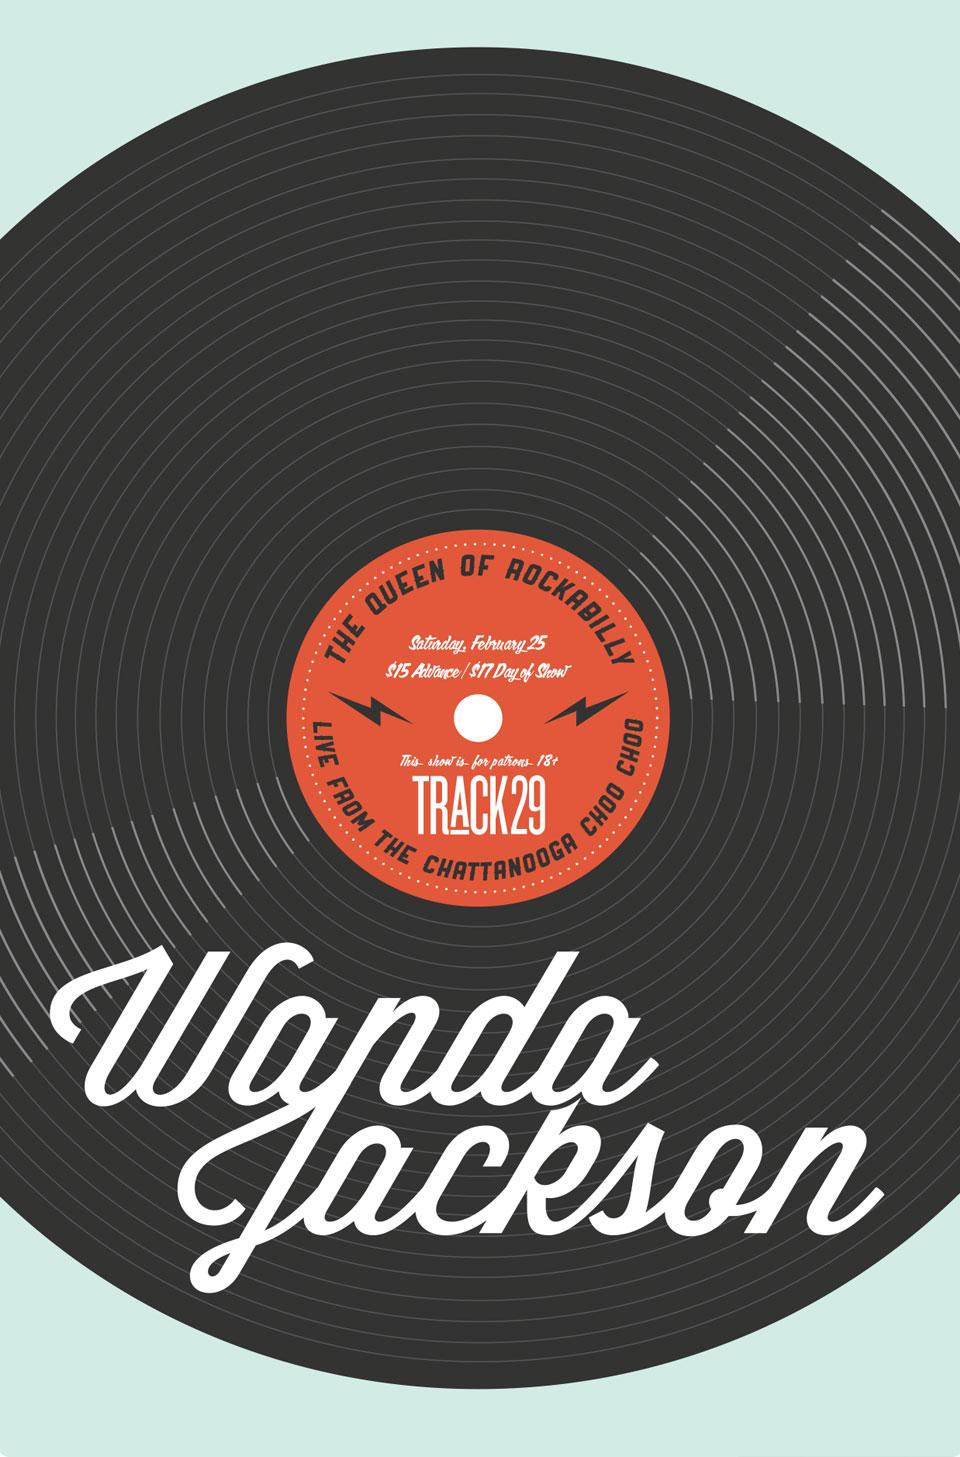 Tiny Giant - Track 29 - Wanda Jackson Poster